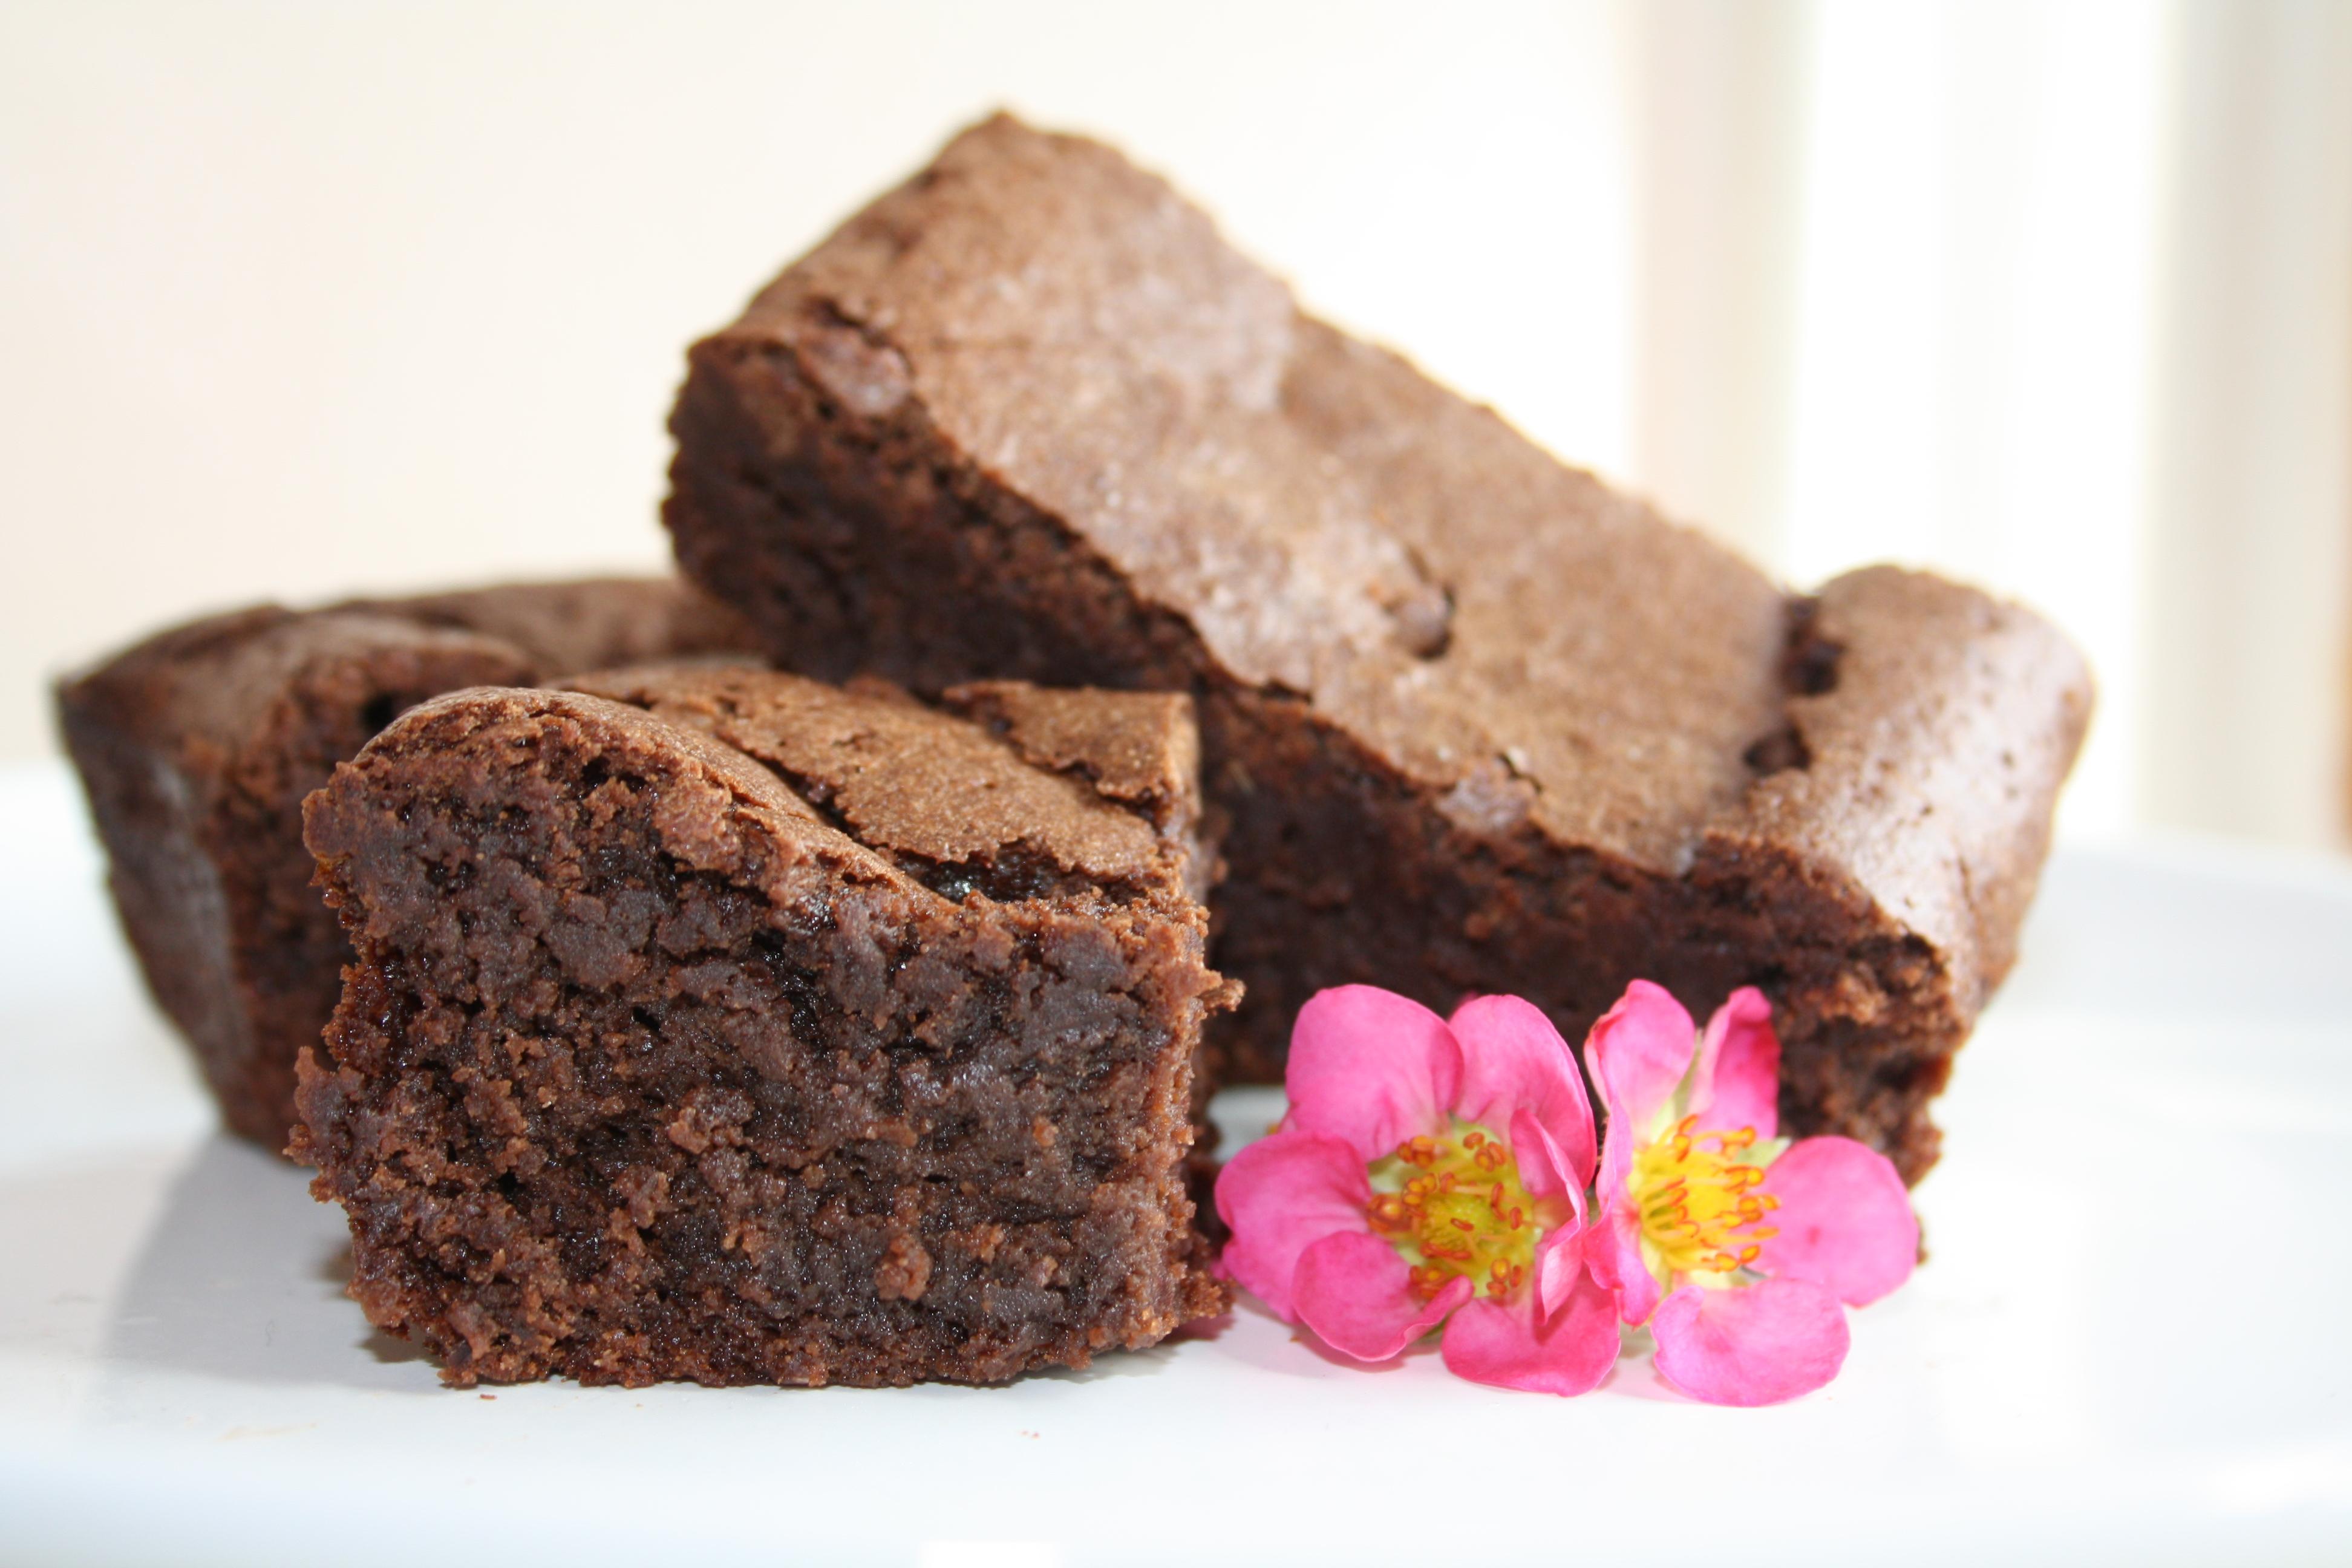 Decadent Gluten Free Chocolate Brownies